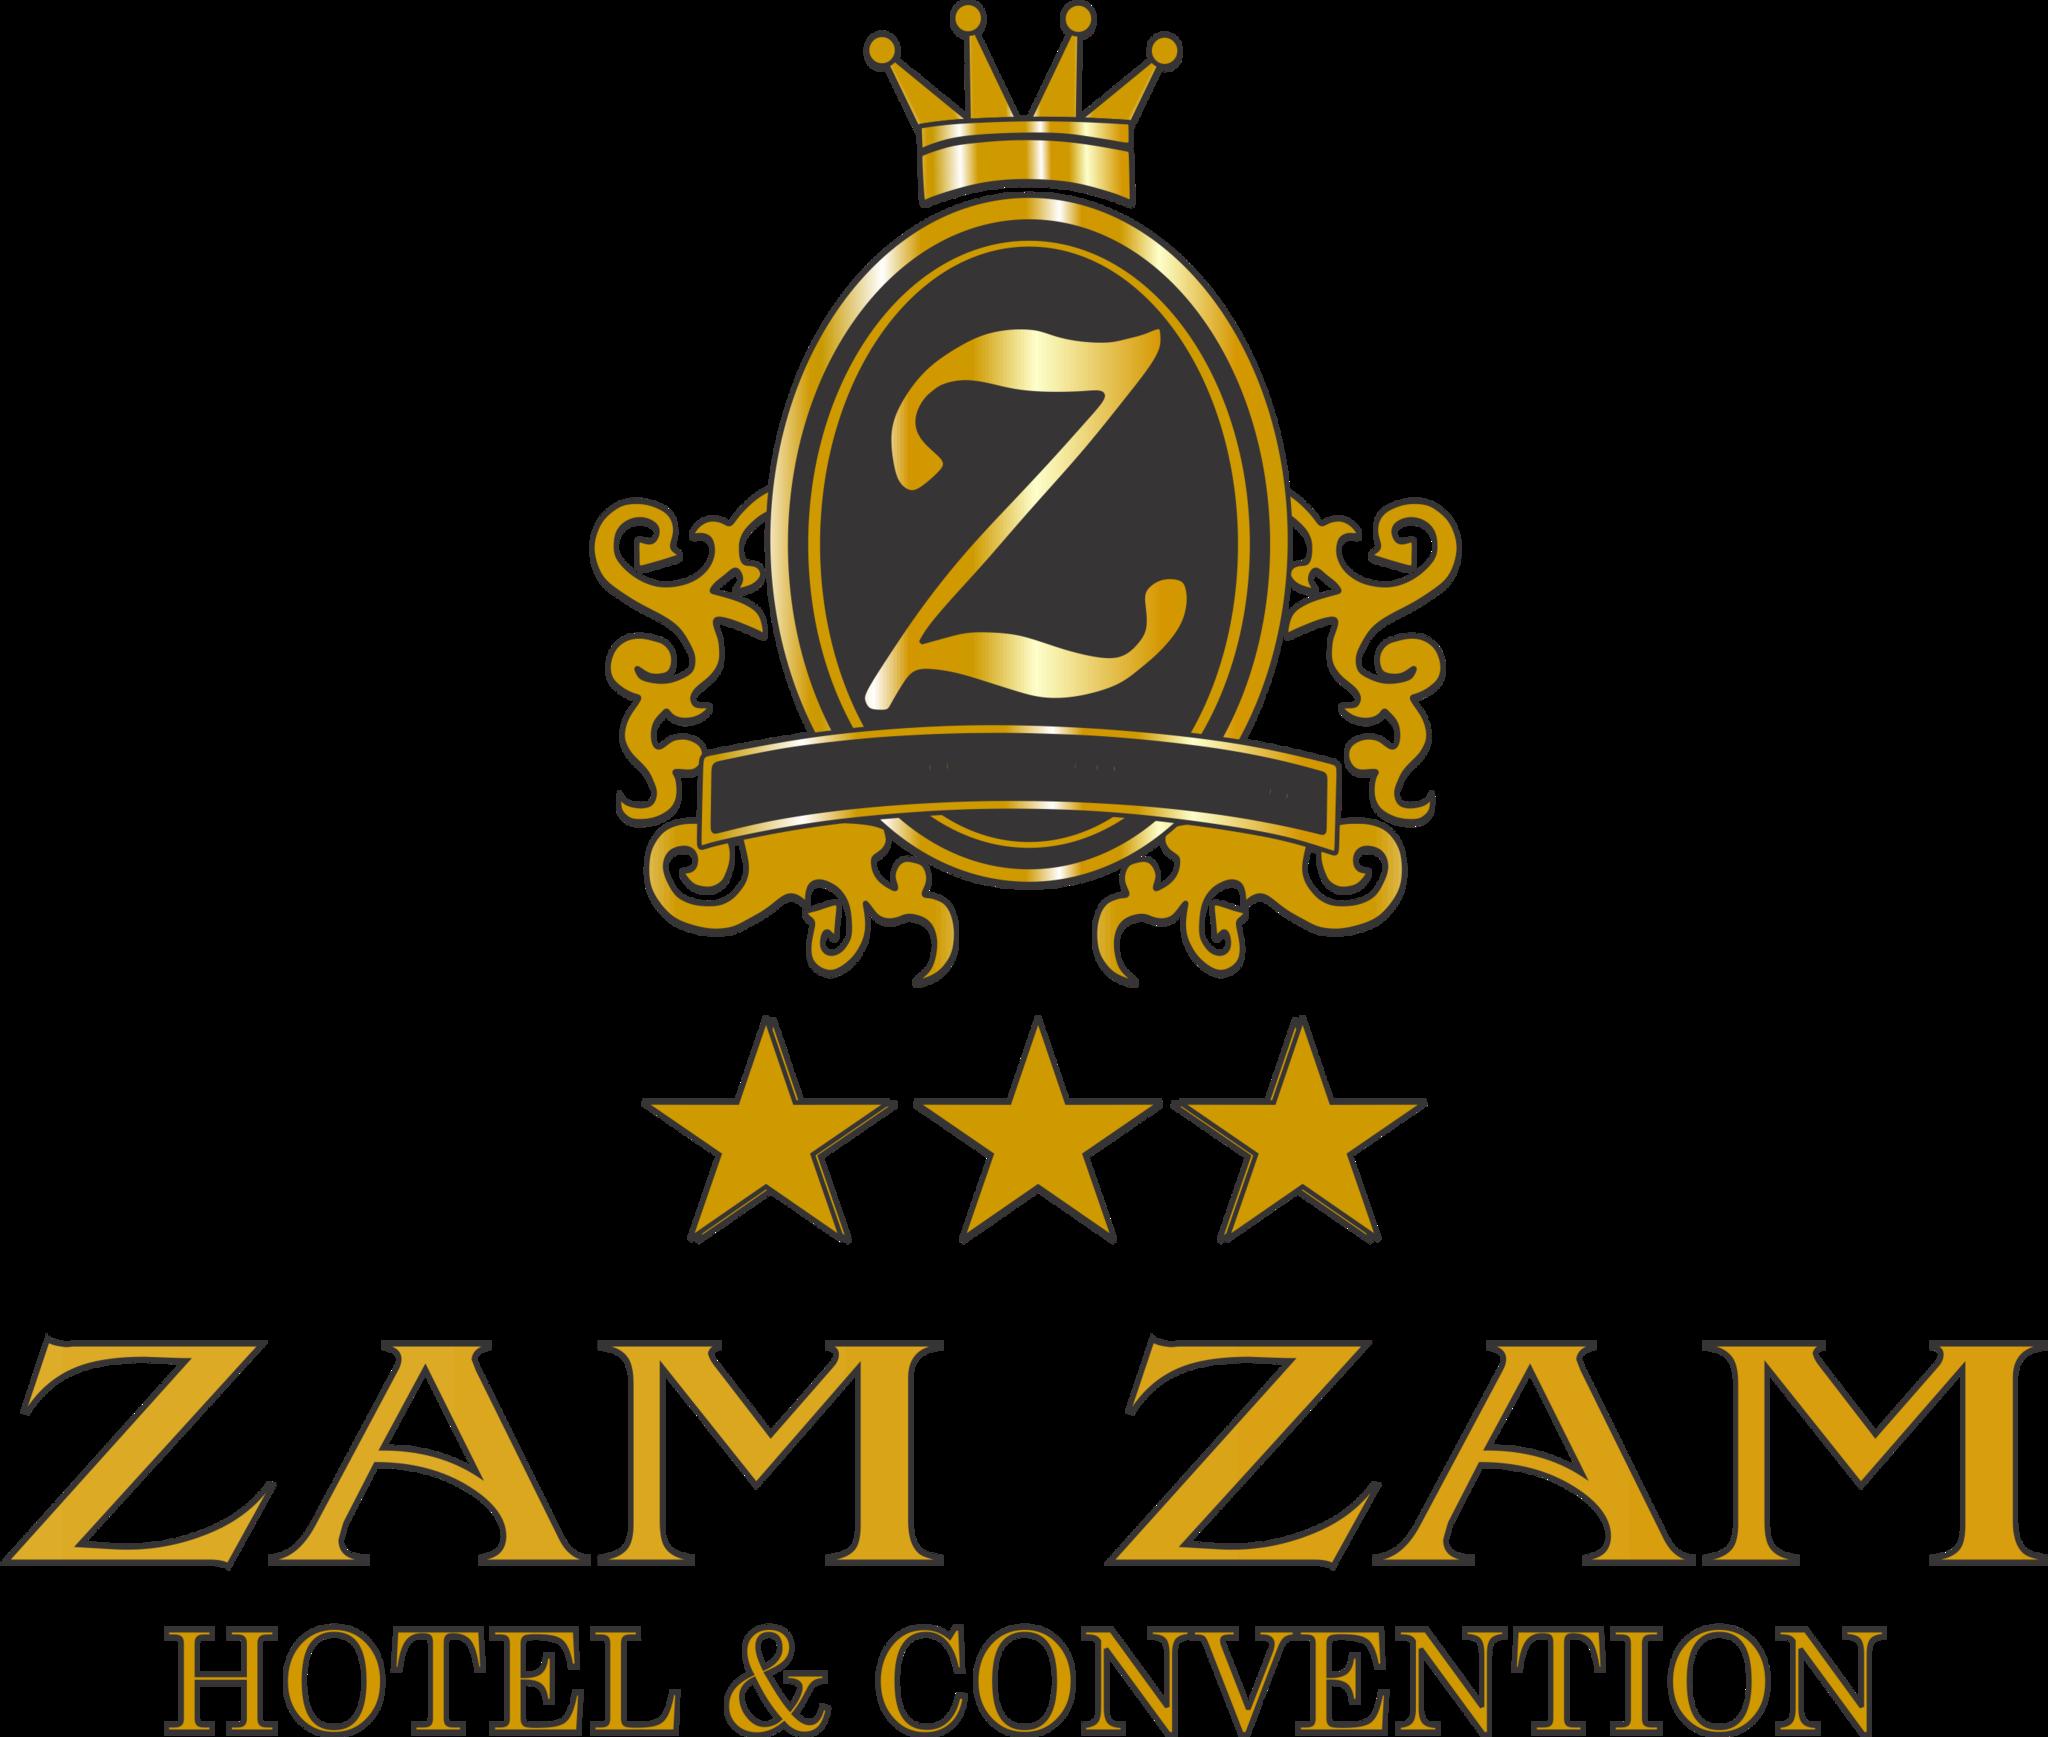 Zamzam Hotel and Resort